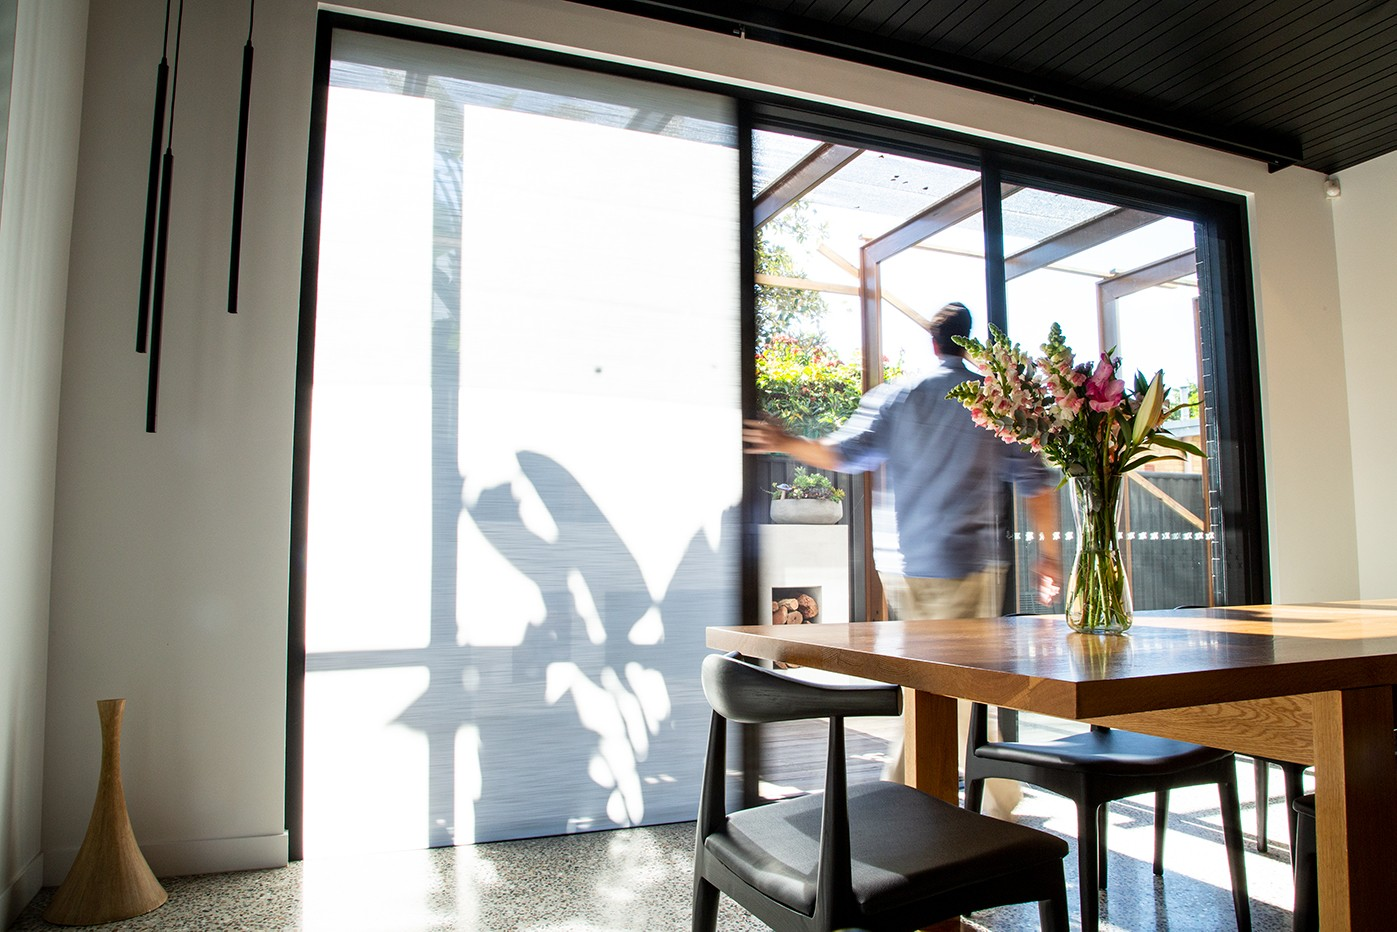 Sideways Sliding Door Blinds - Light Blocking